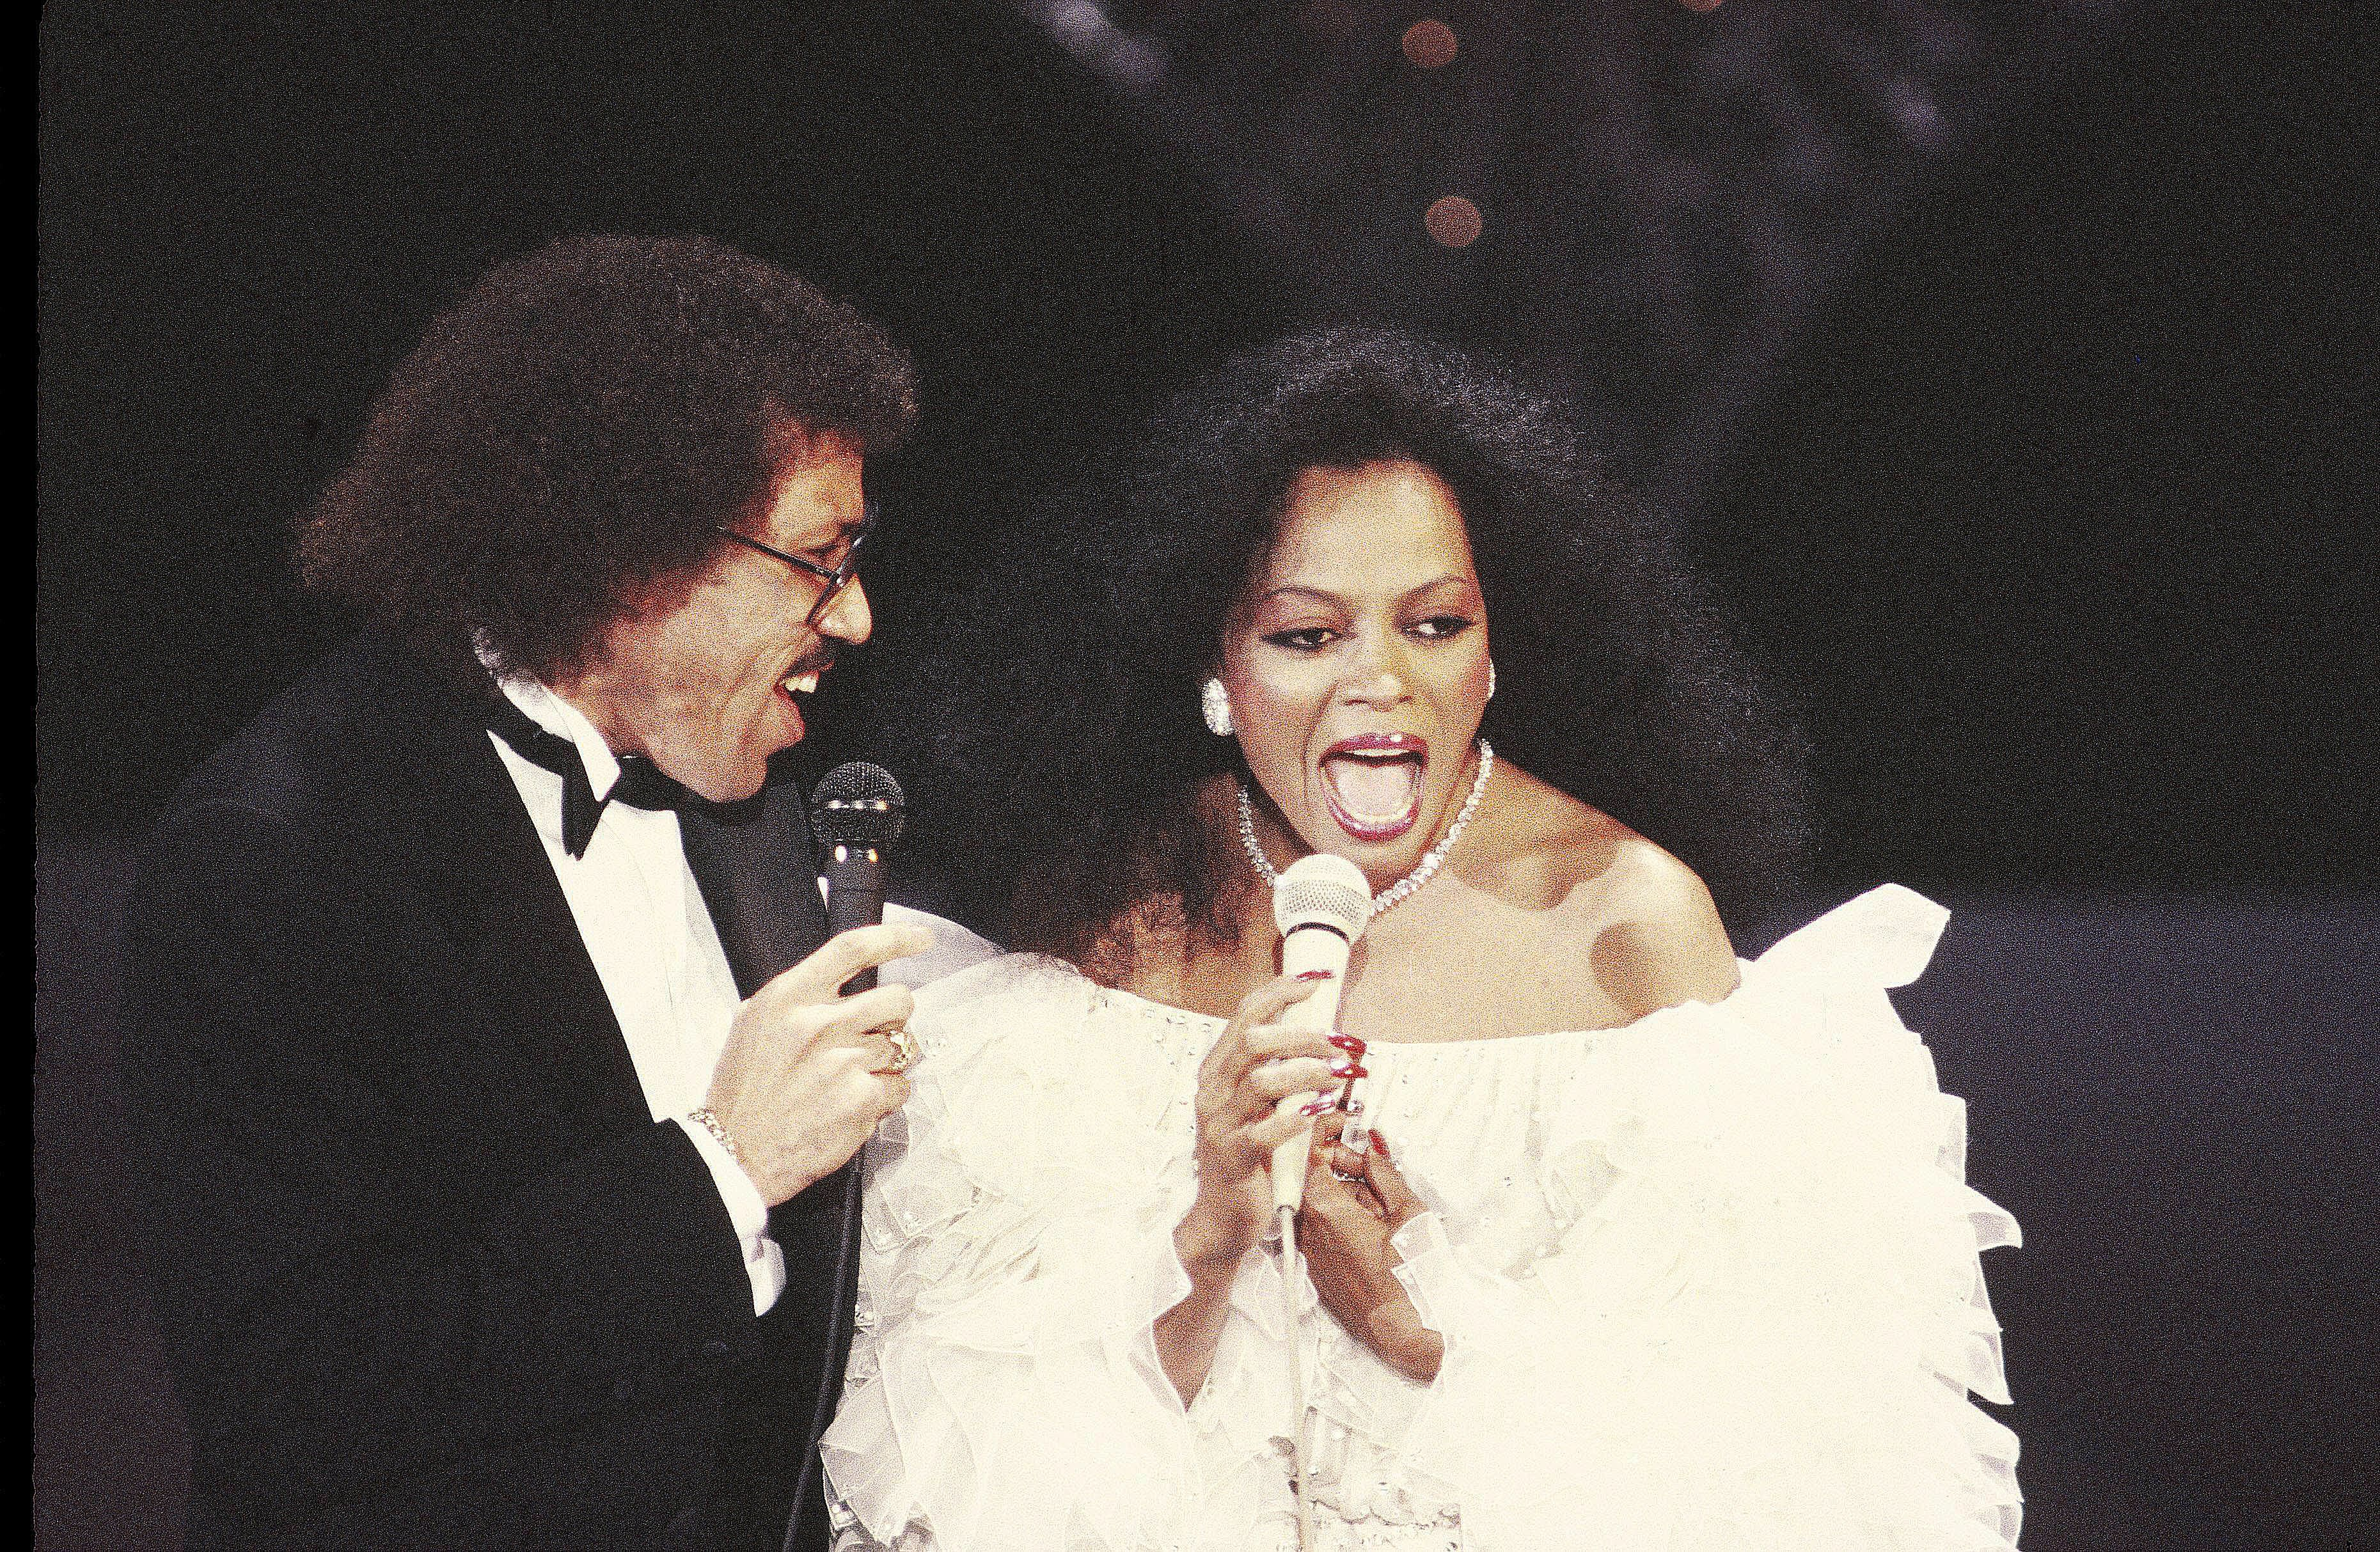 The 15 Greatest R&B Romantic Duets